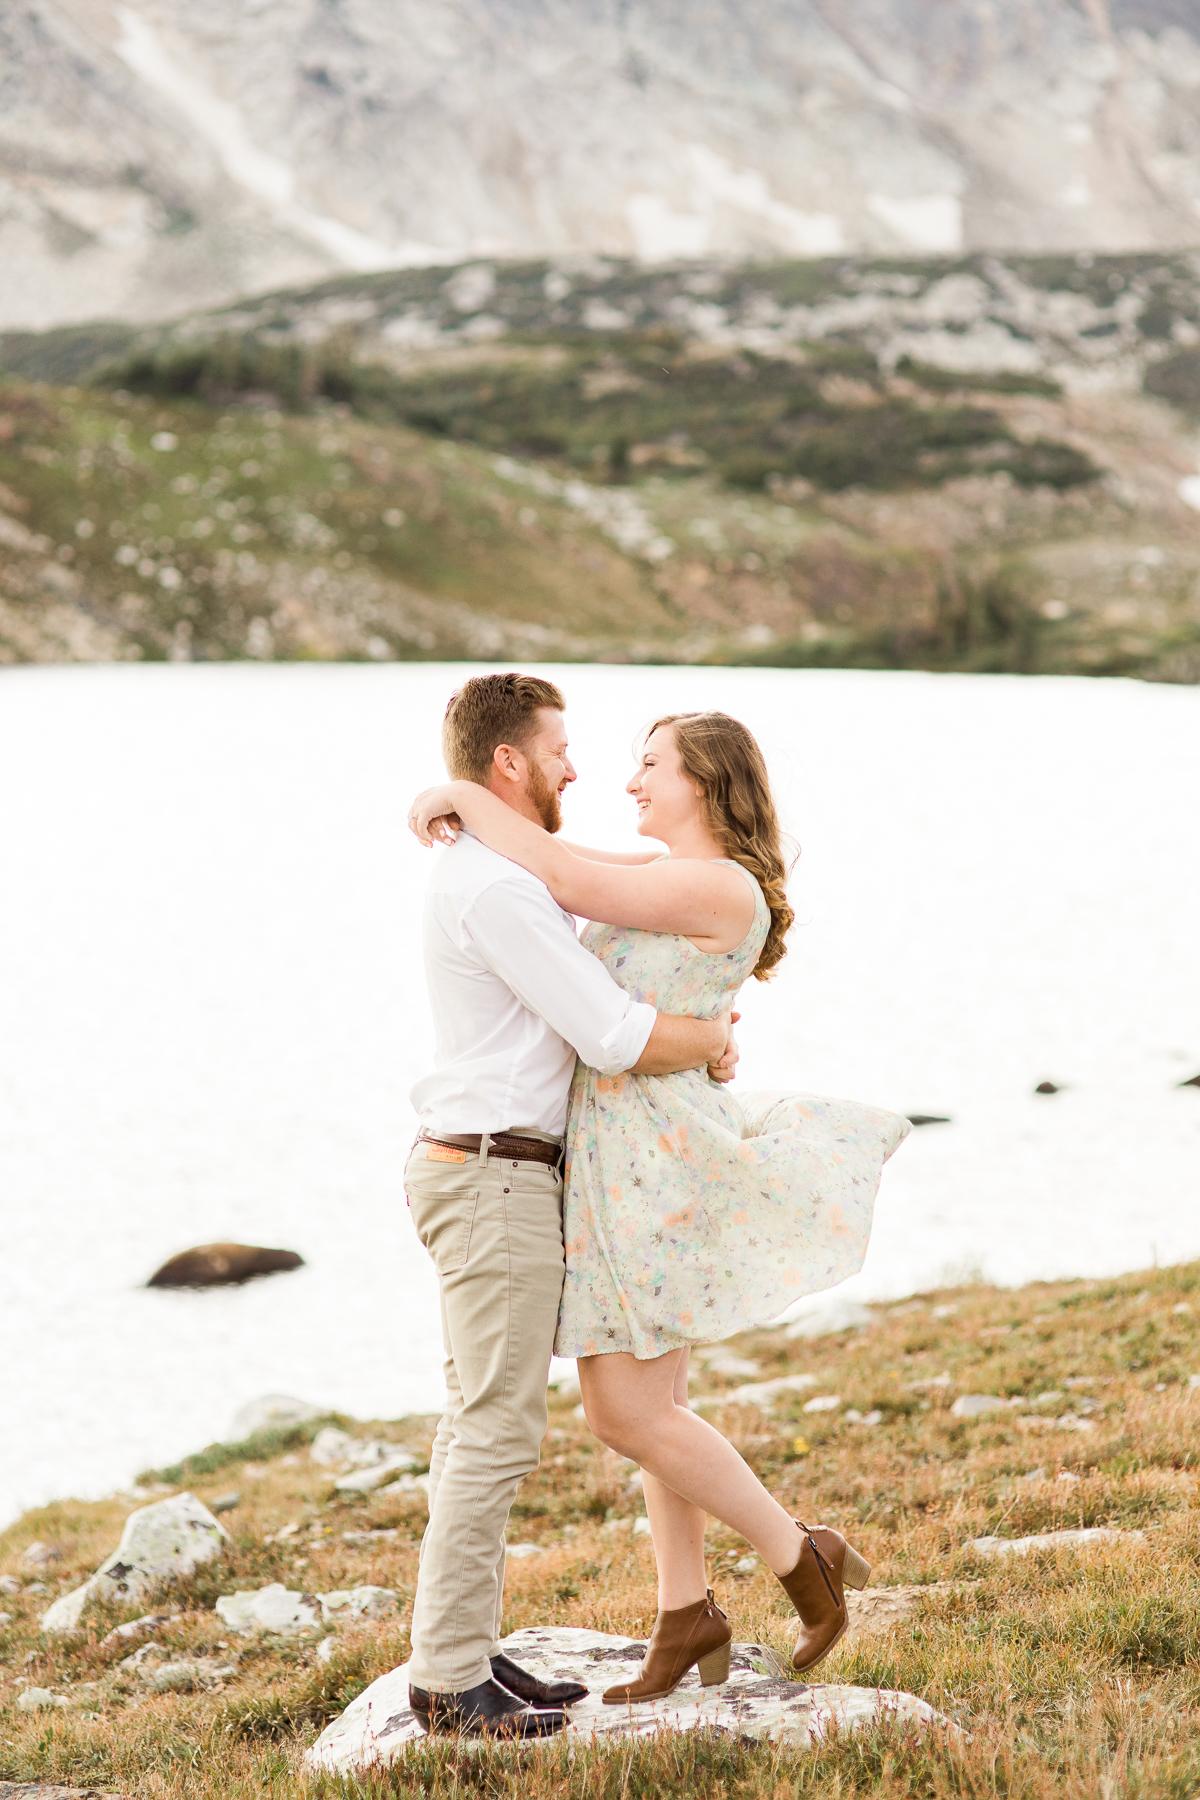 Snowy Range Engagements in Wyoming by Laramie based photographer, Megan Lee Photography